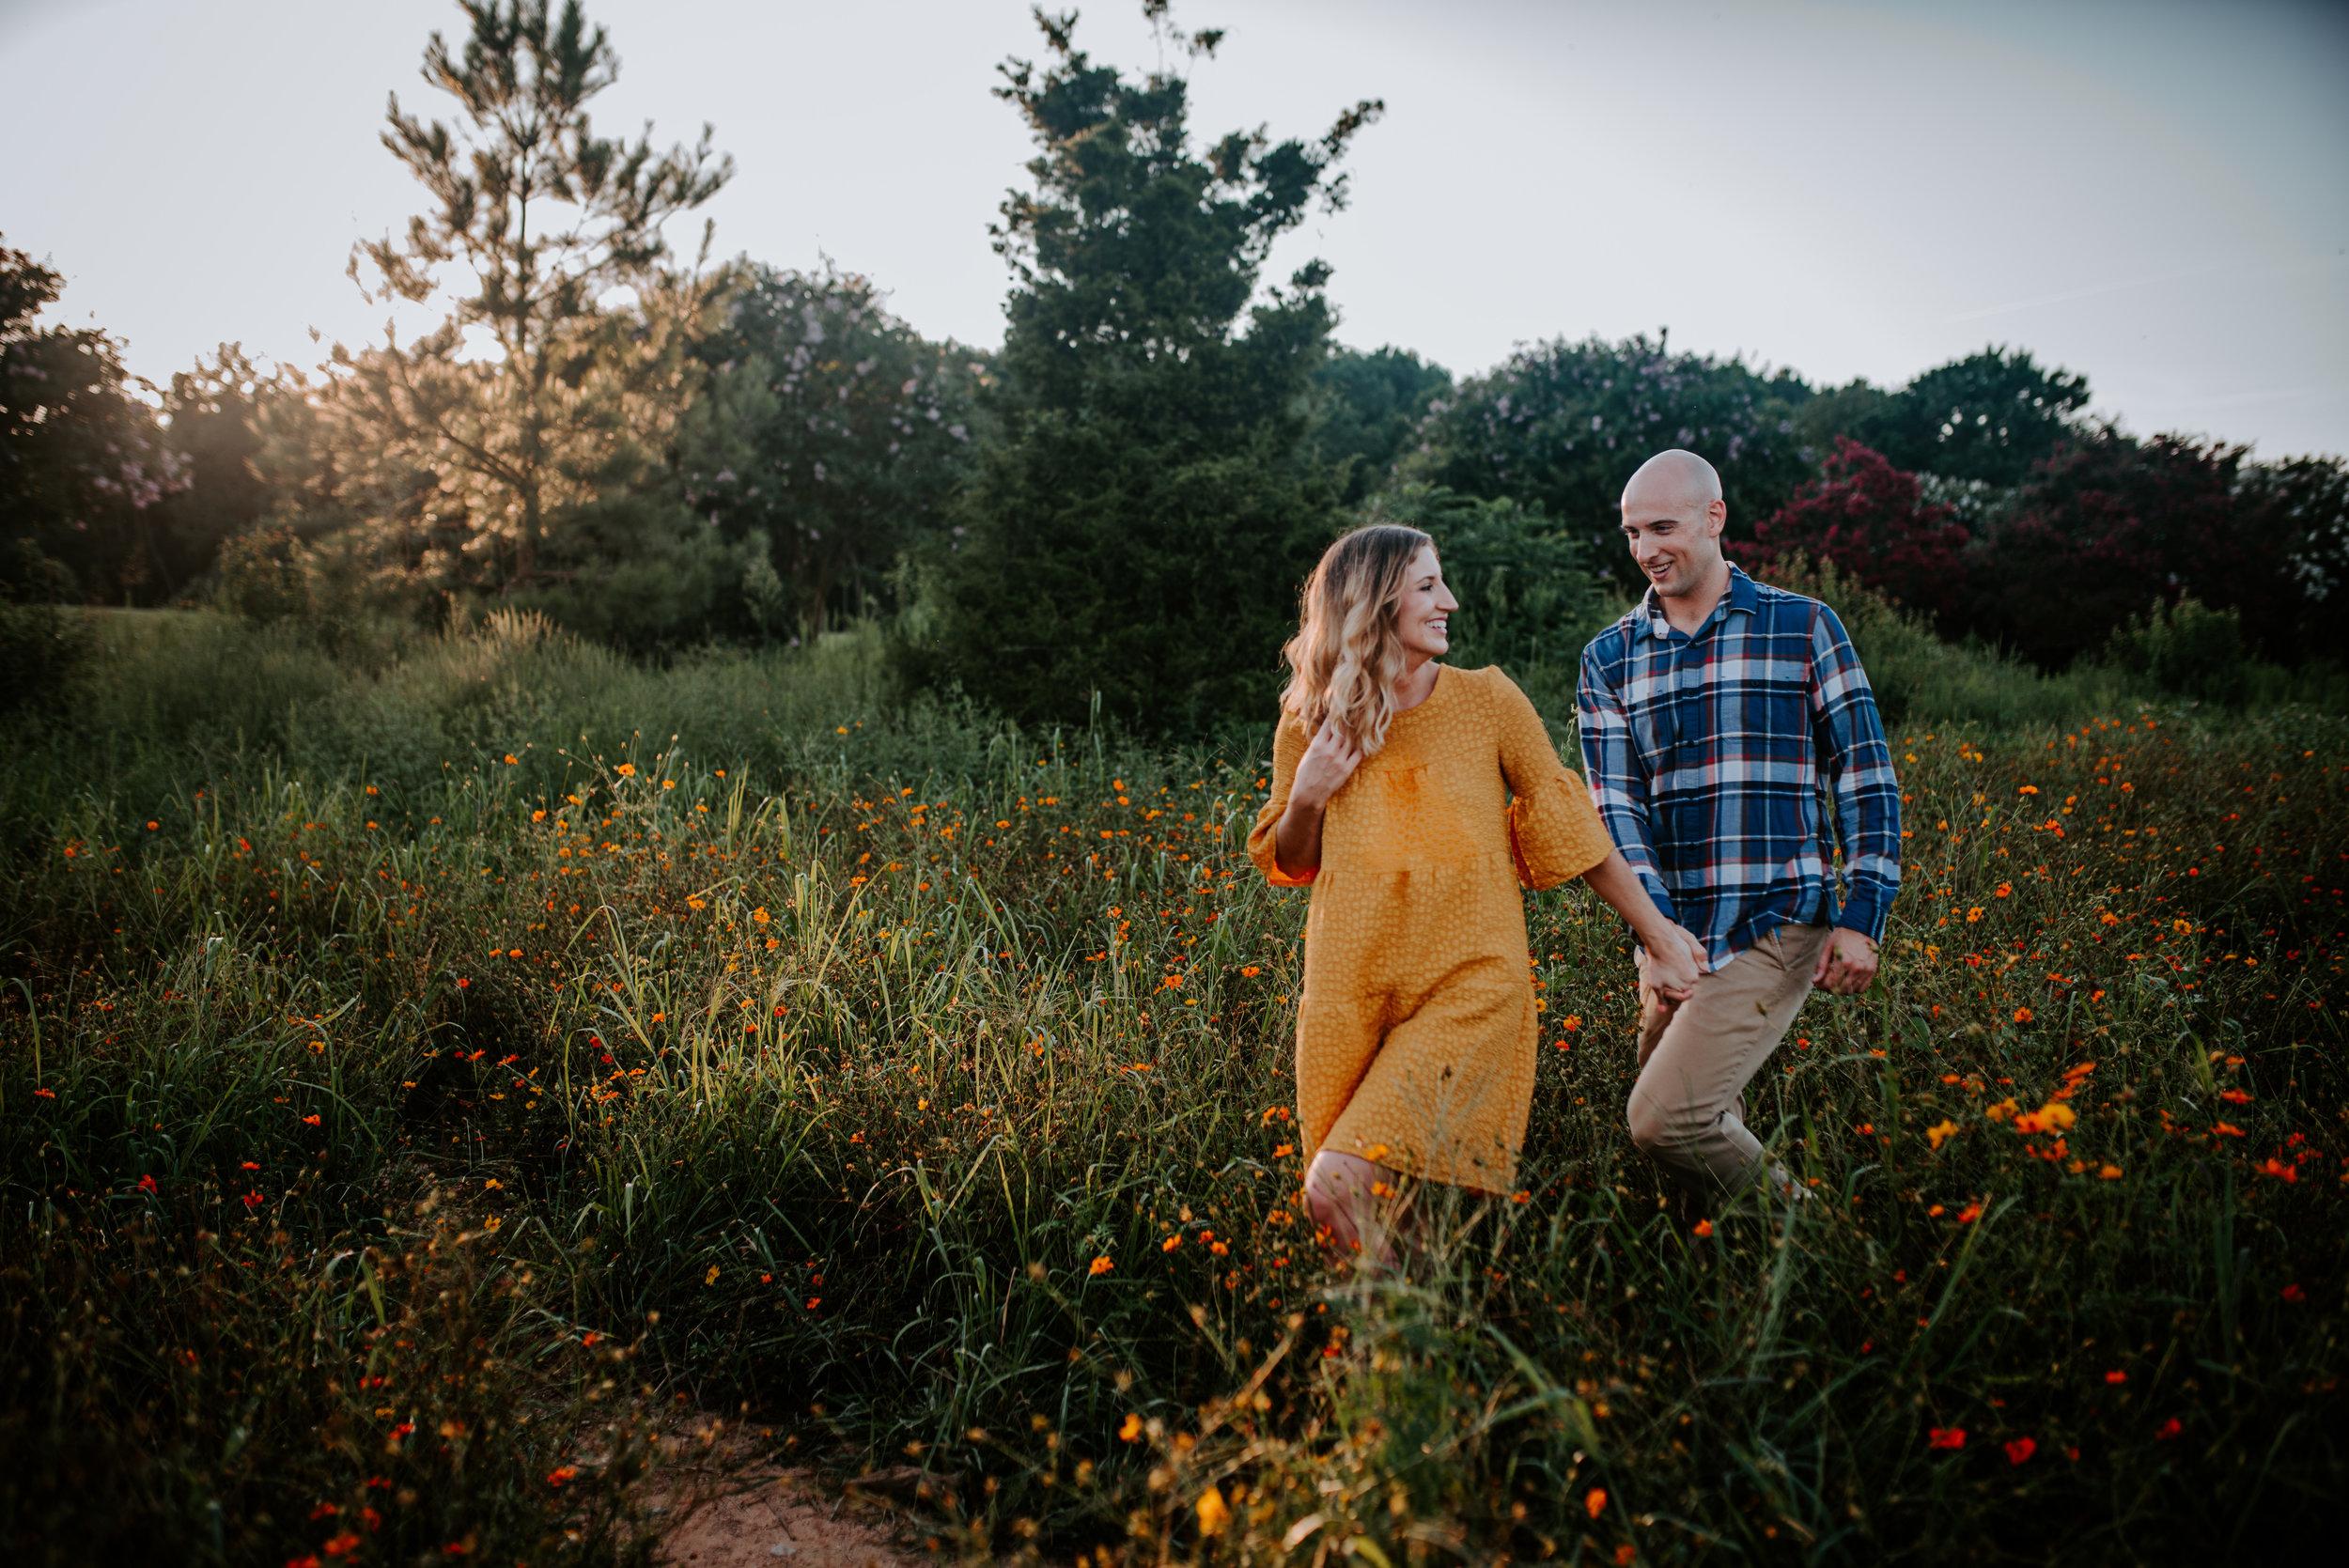 Whiskey Kitchen Engagement - Dorthea Dix Park Engagement - Raleigh Wedding Photographer - Raleigh Engagement Photographer - North Carolina Wedding Photographer